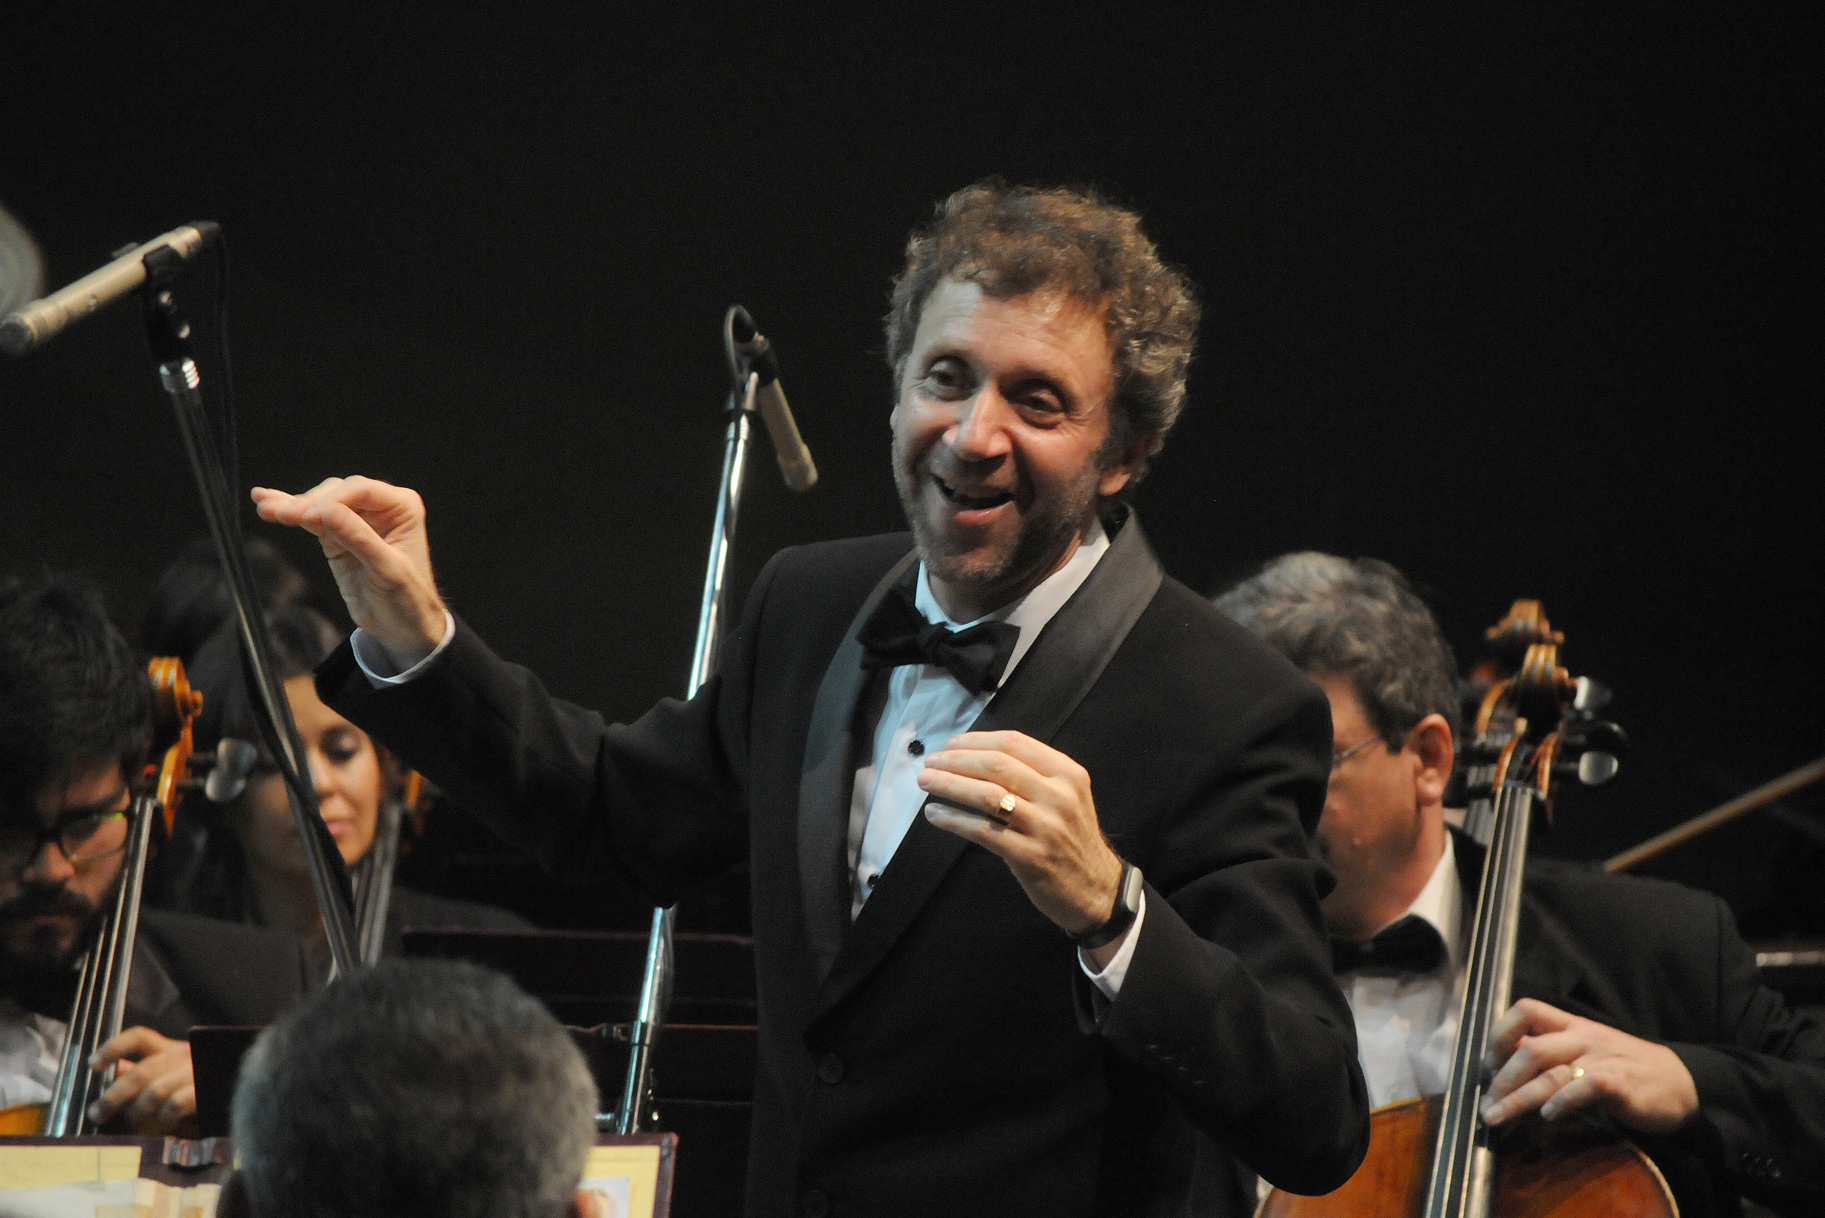 Gustavo-Fontana